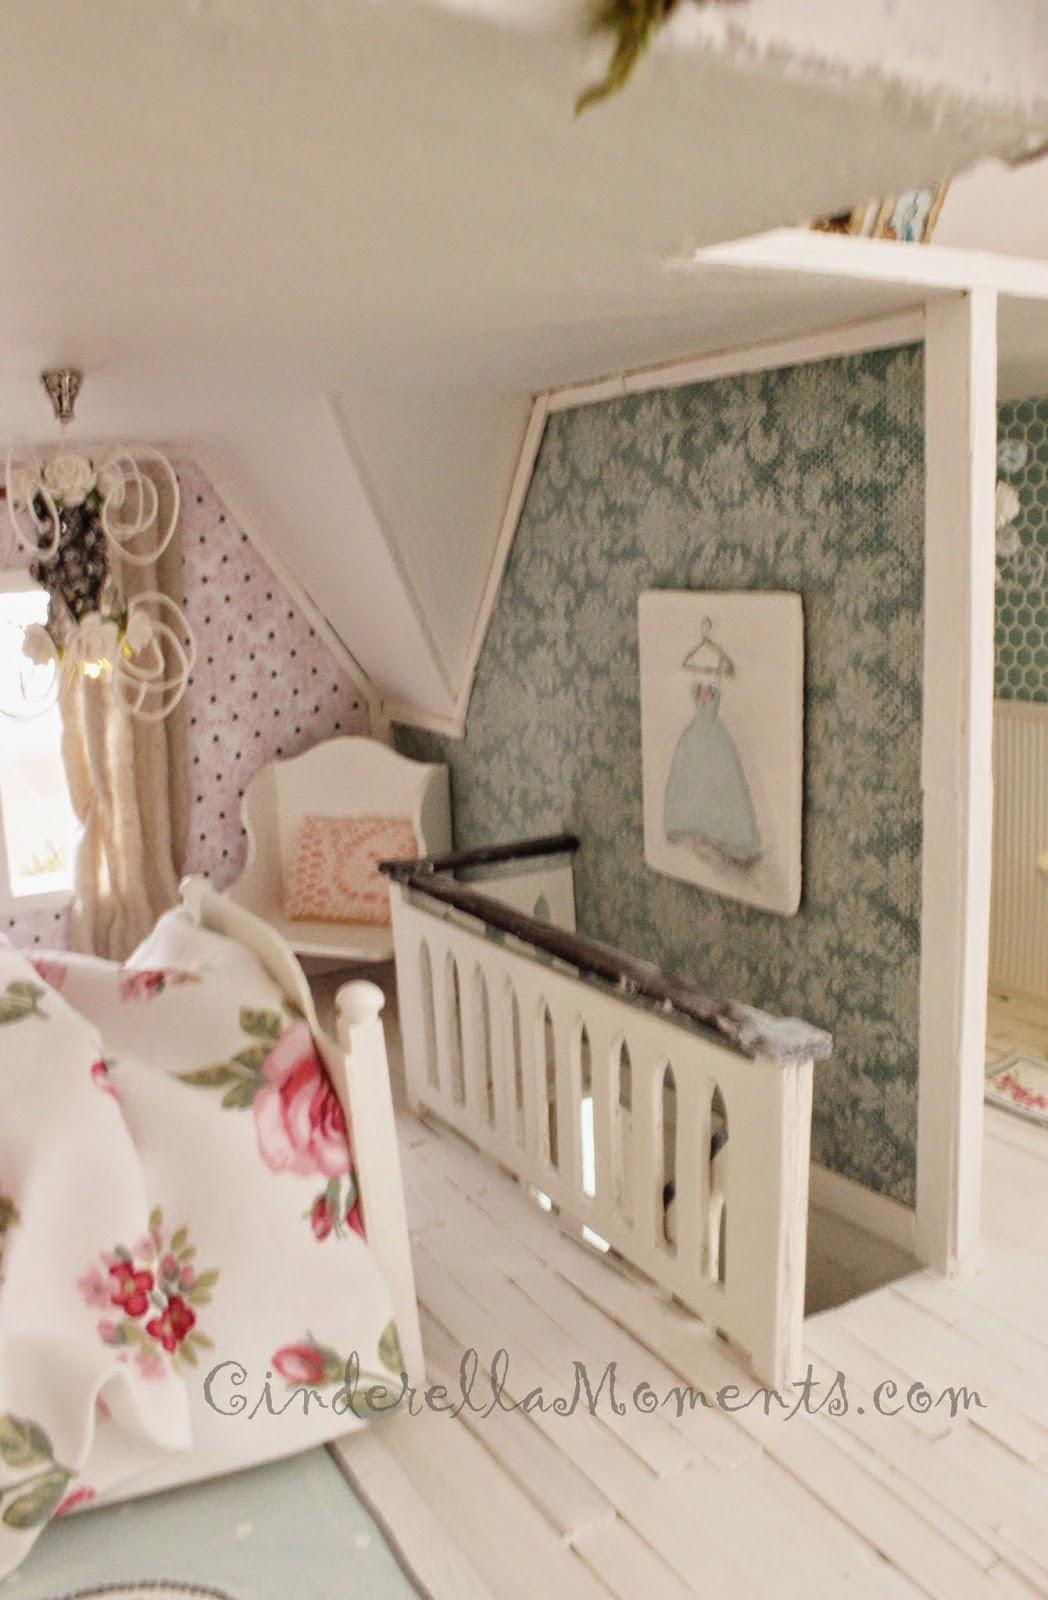 Cinderella Moments Wiltshire Cottage Dollhouse